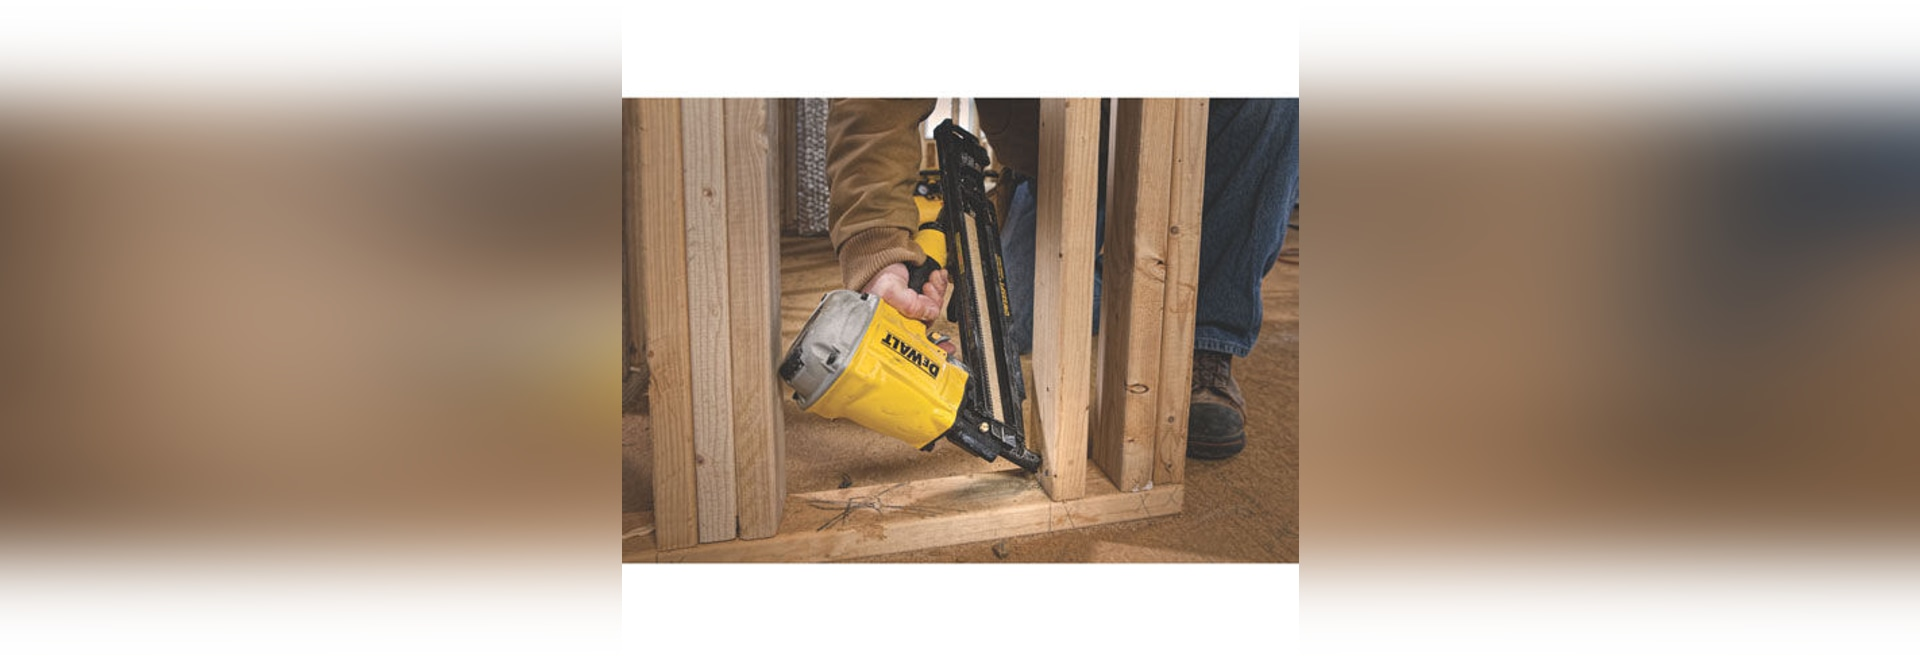 NEW: nail gun by DEWALT Industrial Tool